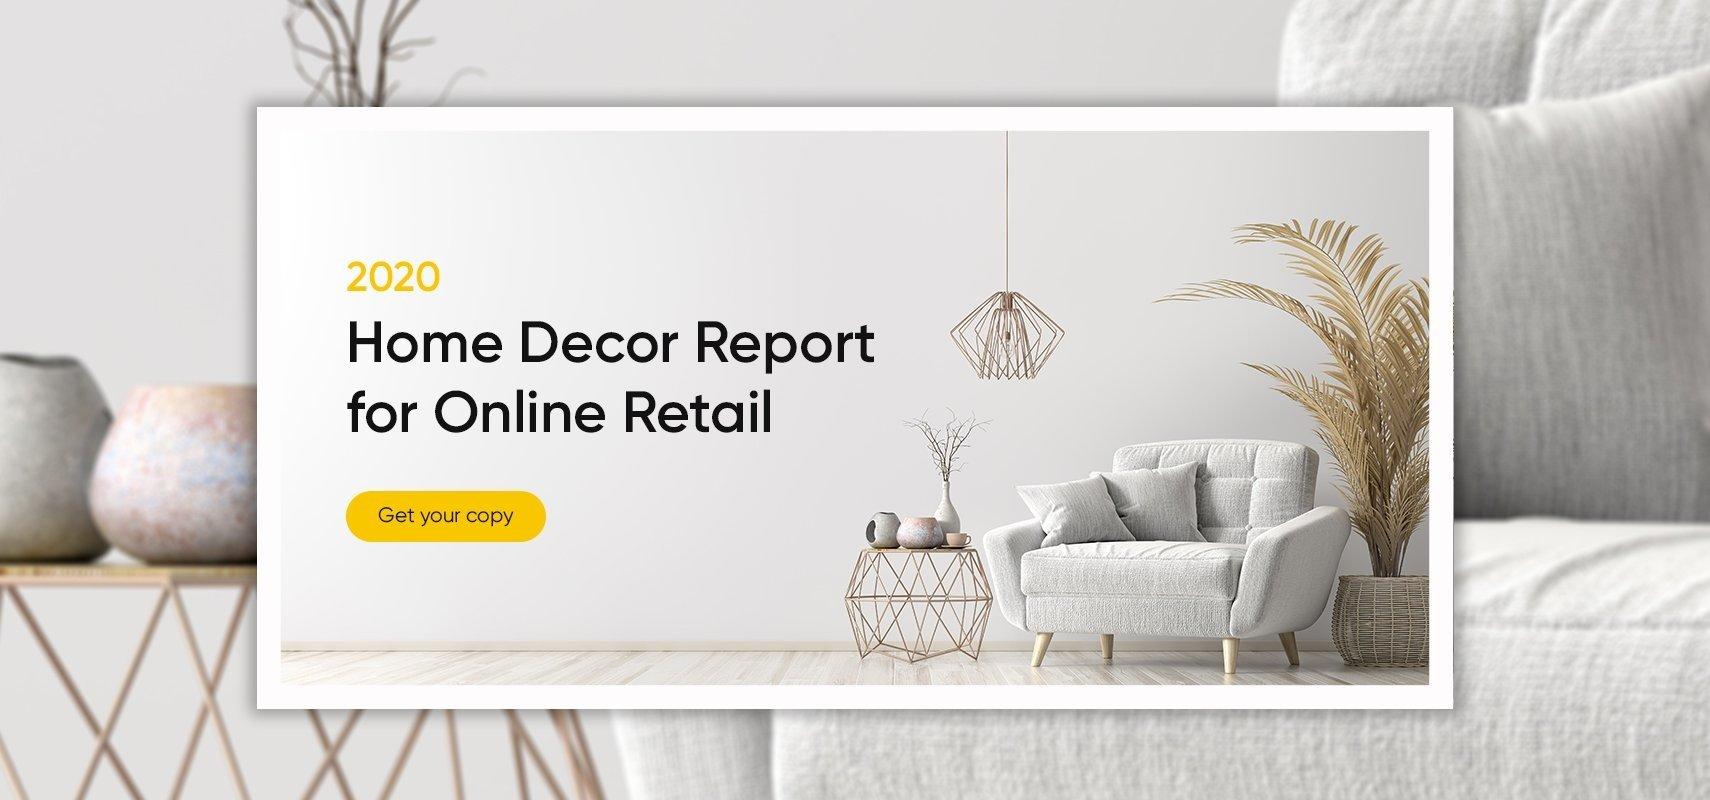 2020 Home Decor Report